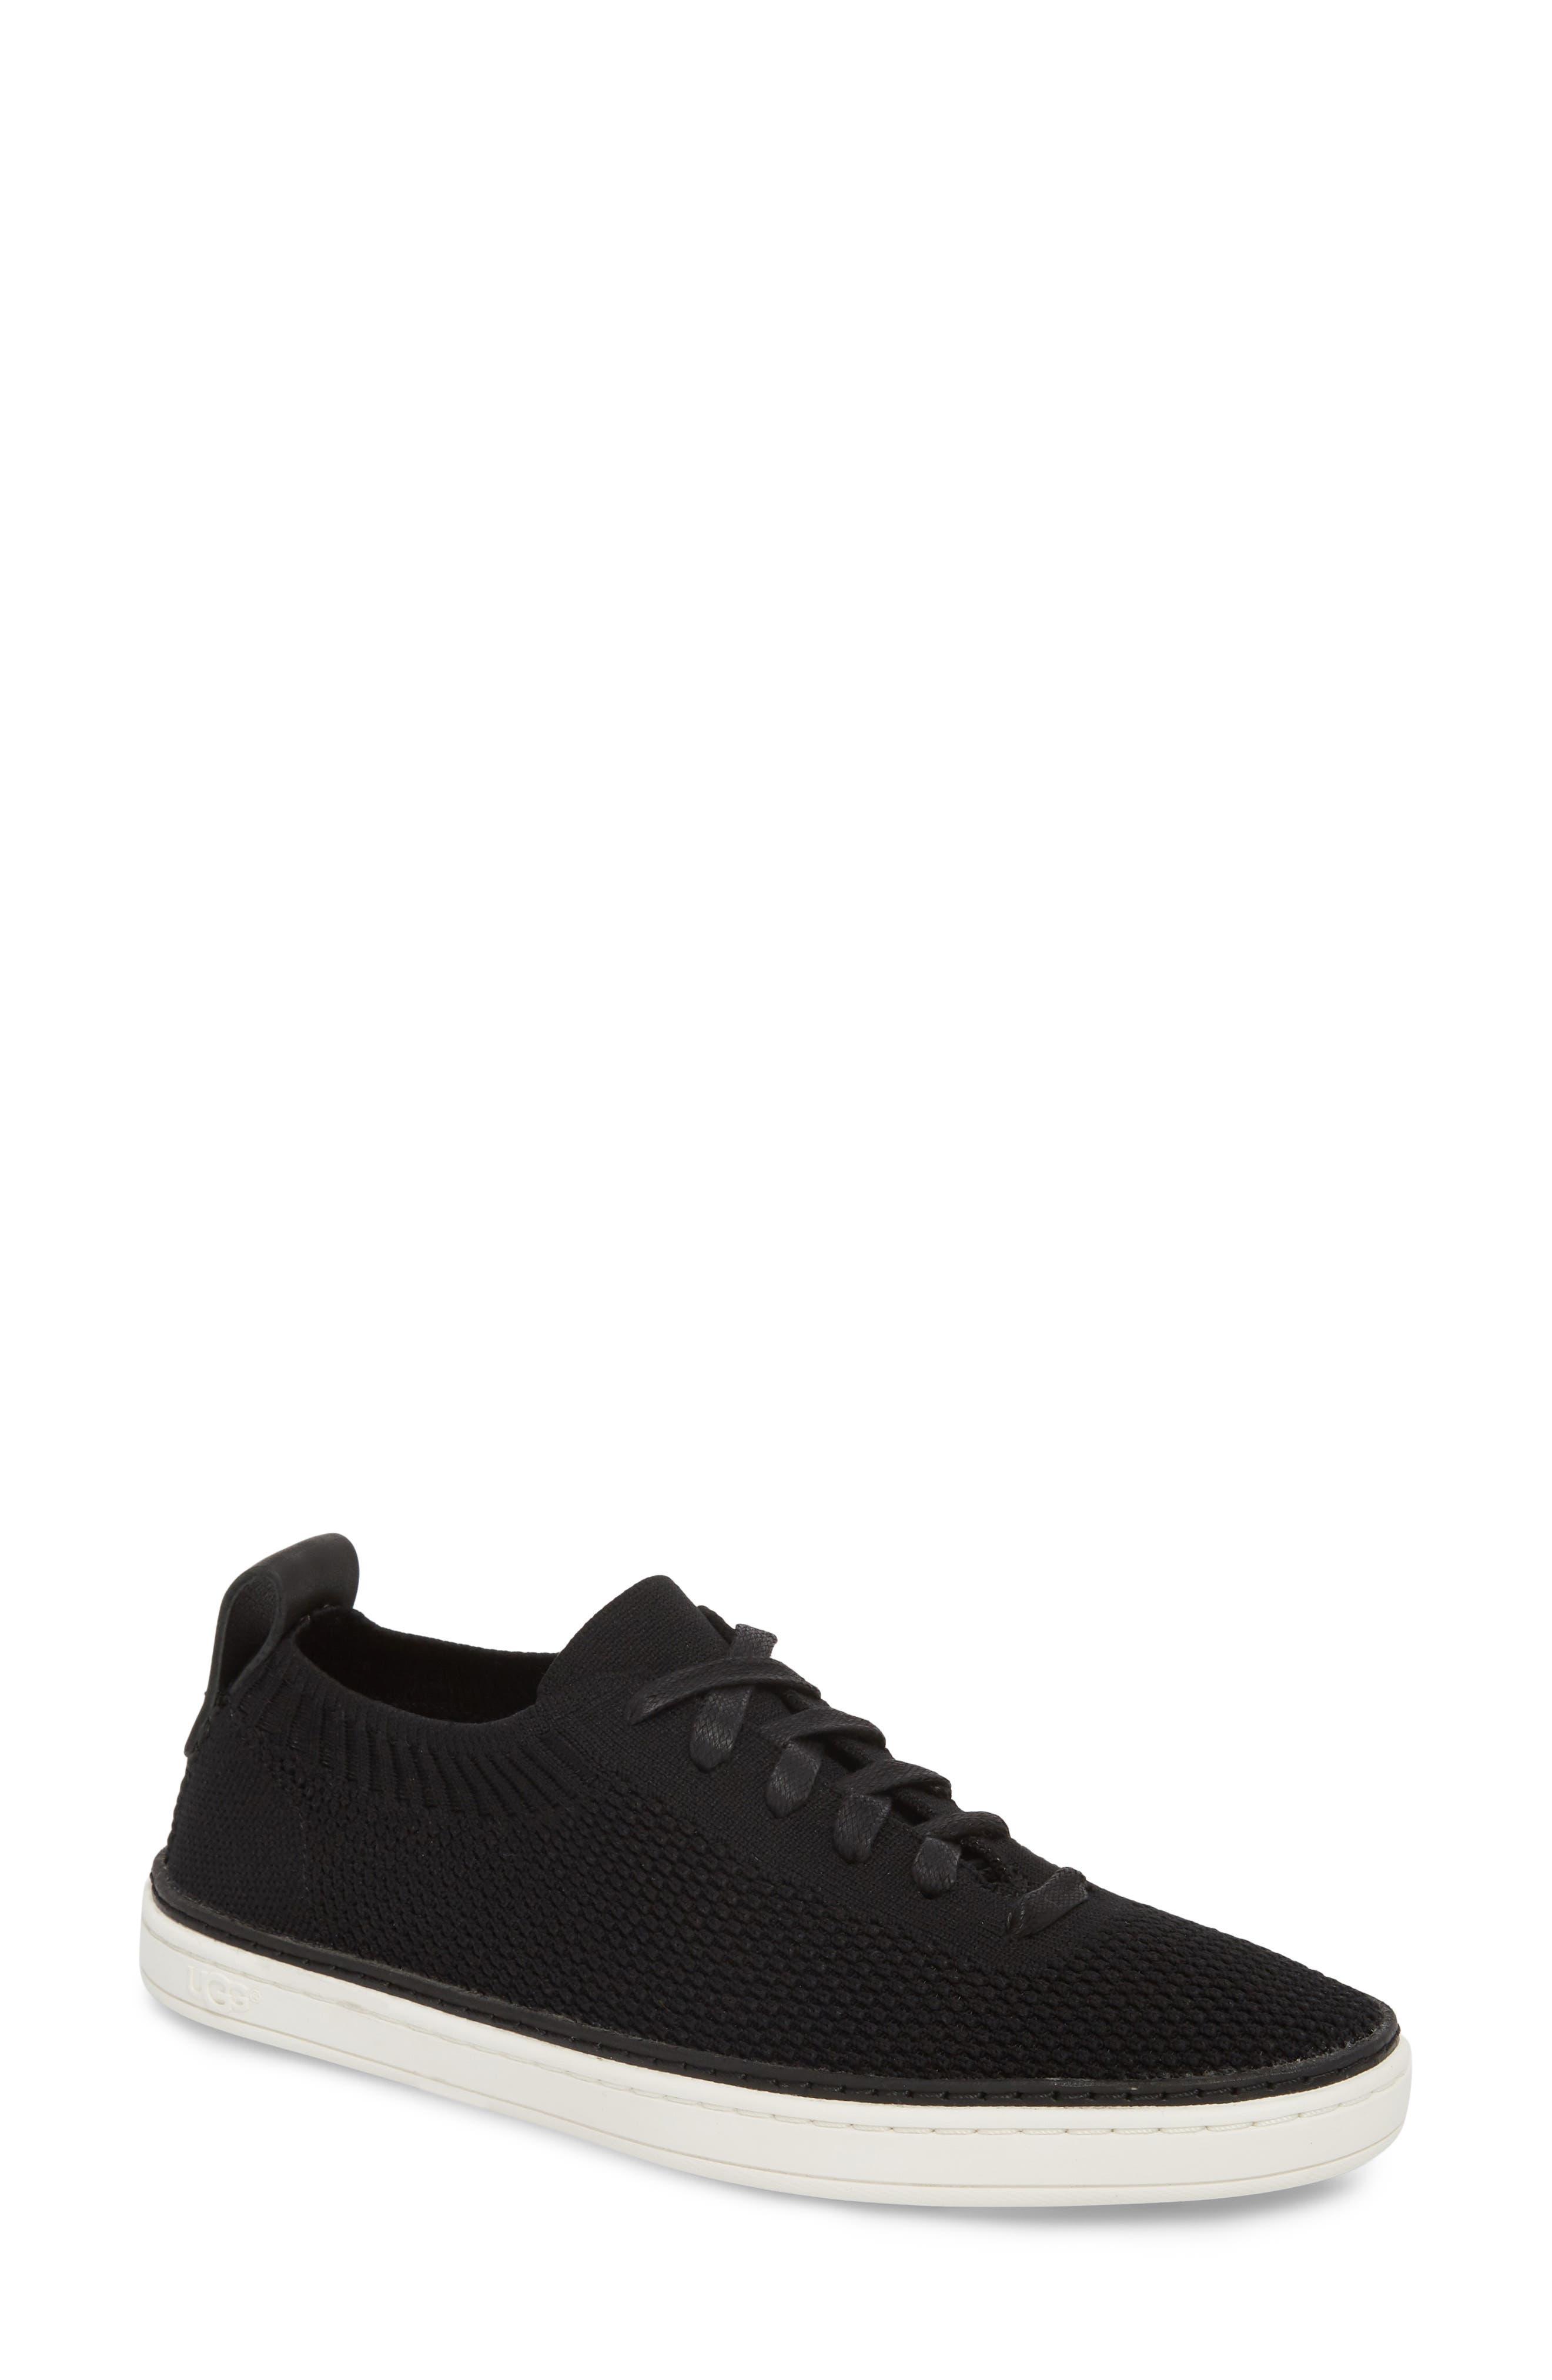 Sidney Sneaker,                             Main thumbnail 1, color,                             BLACK FABRIC